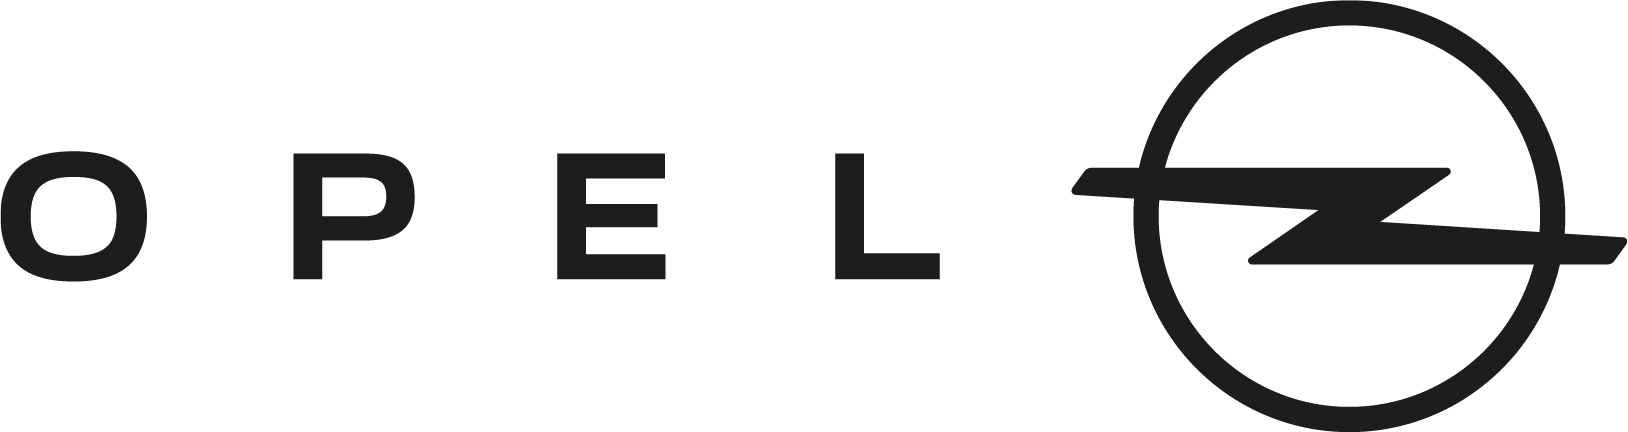 200909 OPEL horizontal